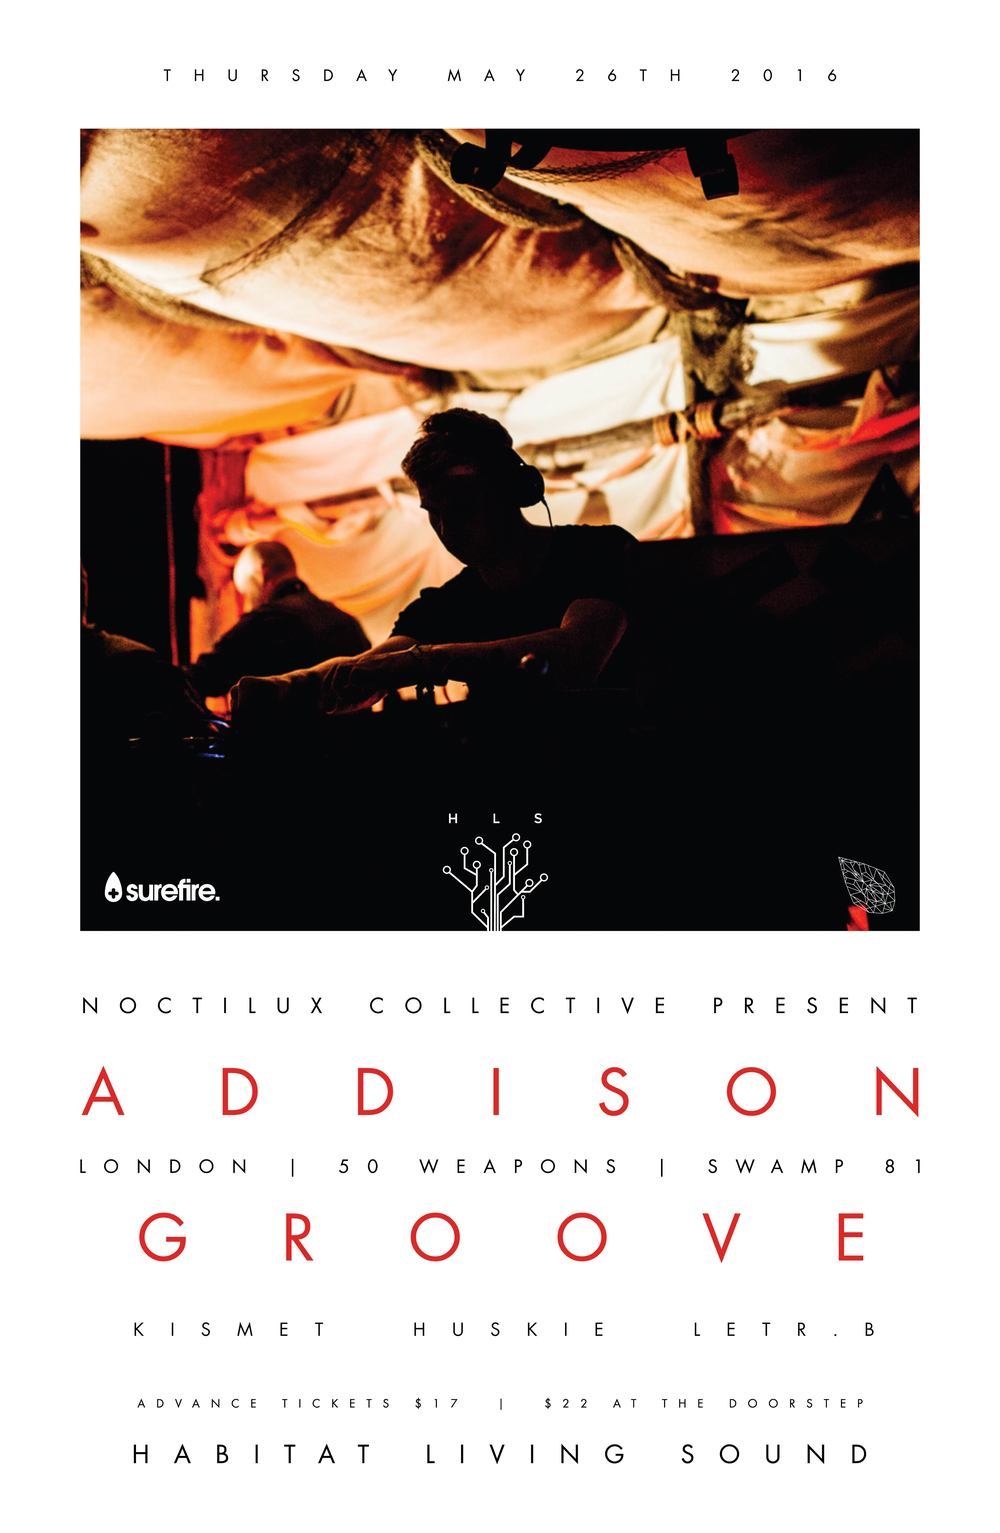 Addison-groove-habitat-living-sound.jpeg